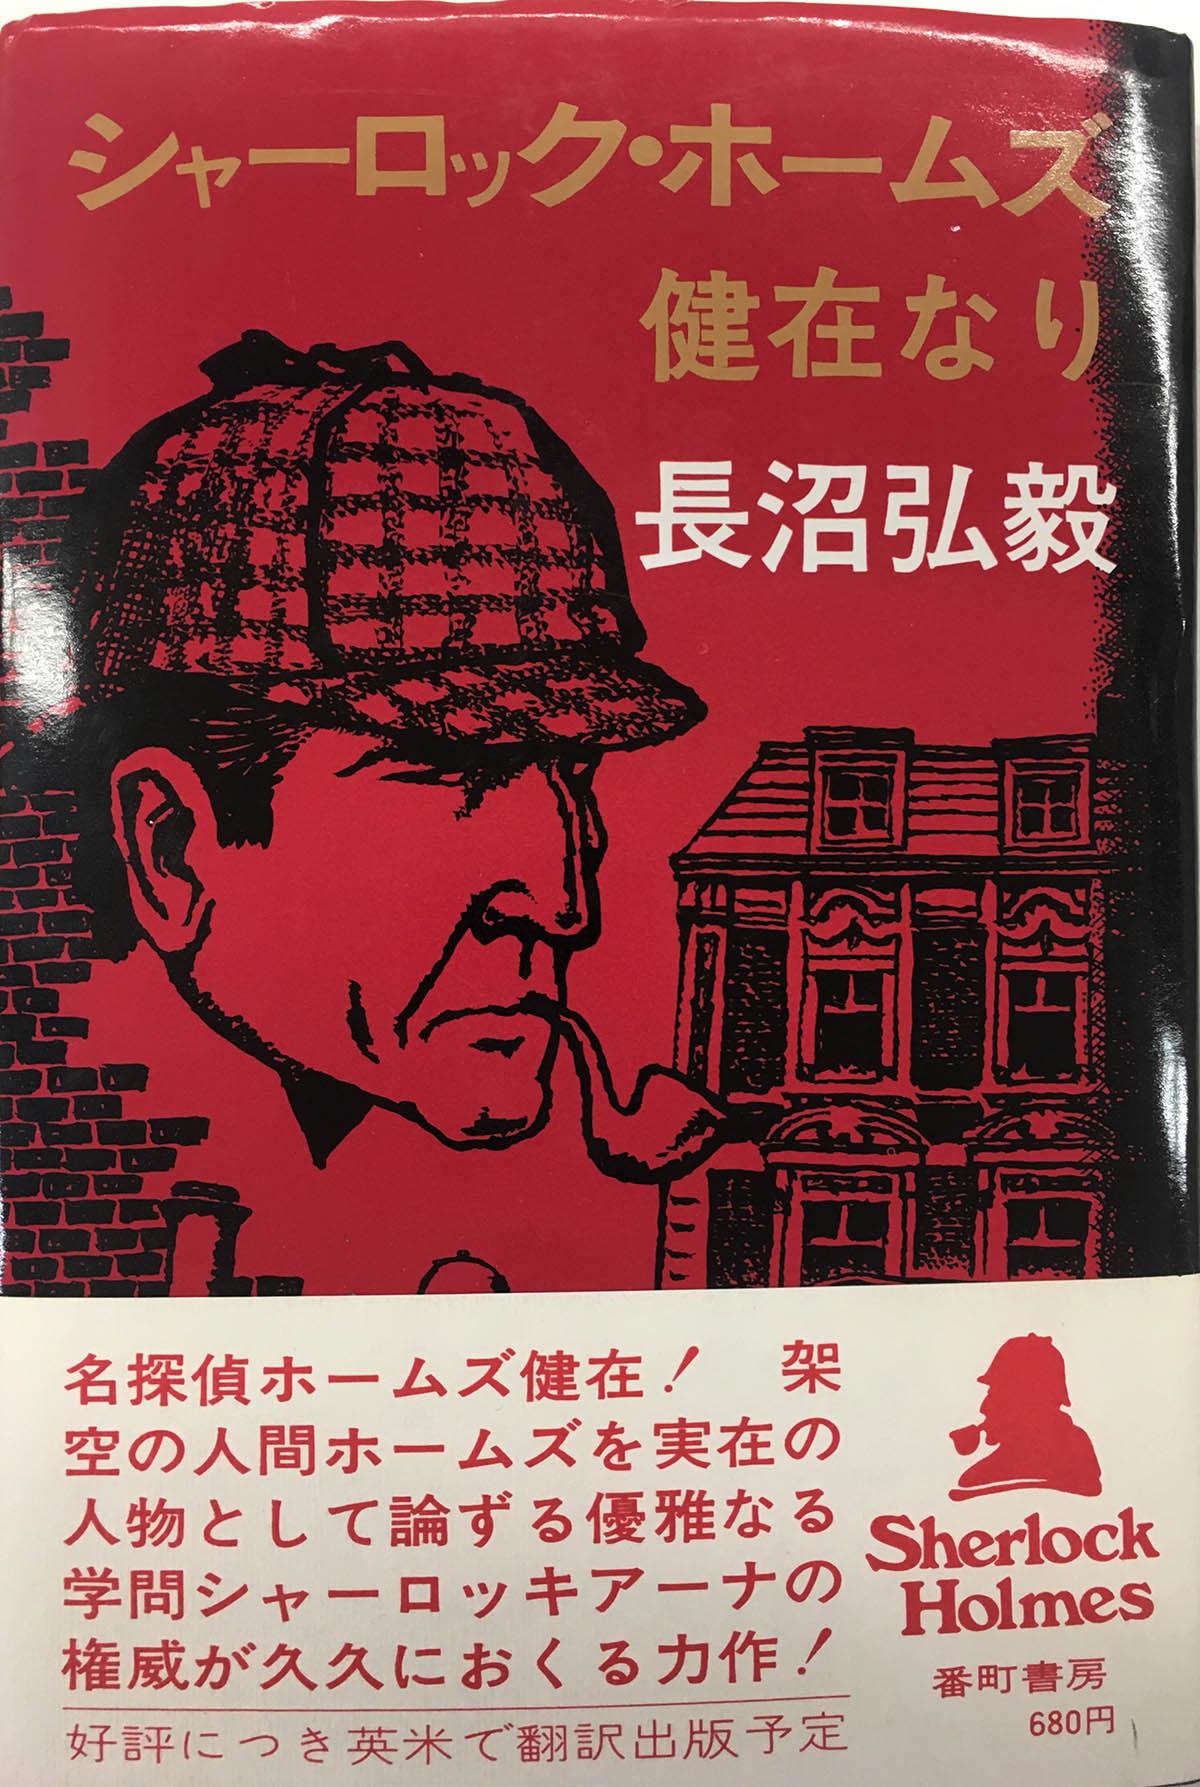 Naganuma, Hiromu. Sherlock Holmes Alive. Tokyo: Bancho Shobo, 1972.